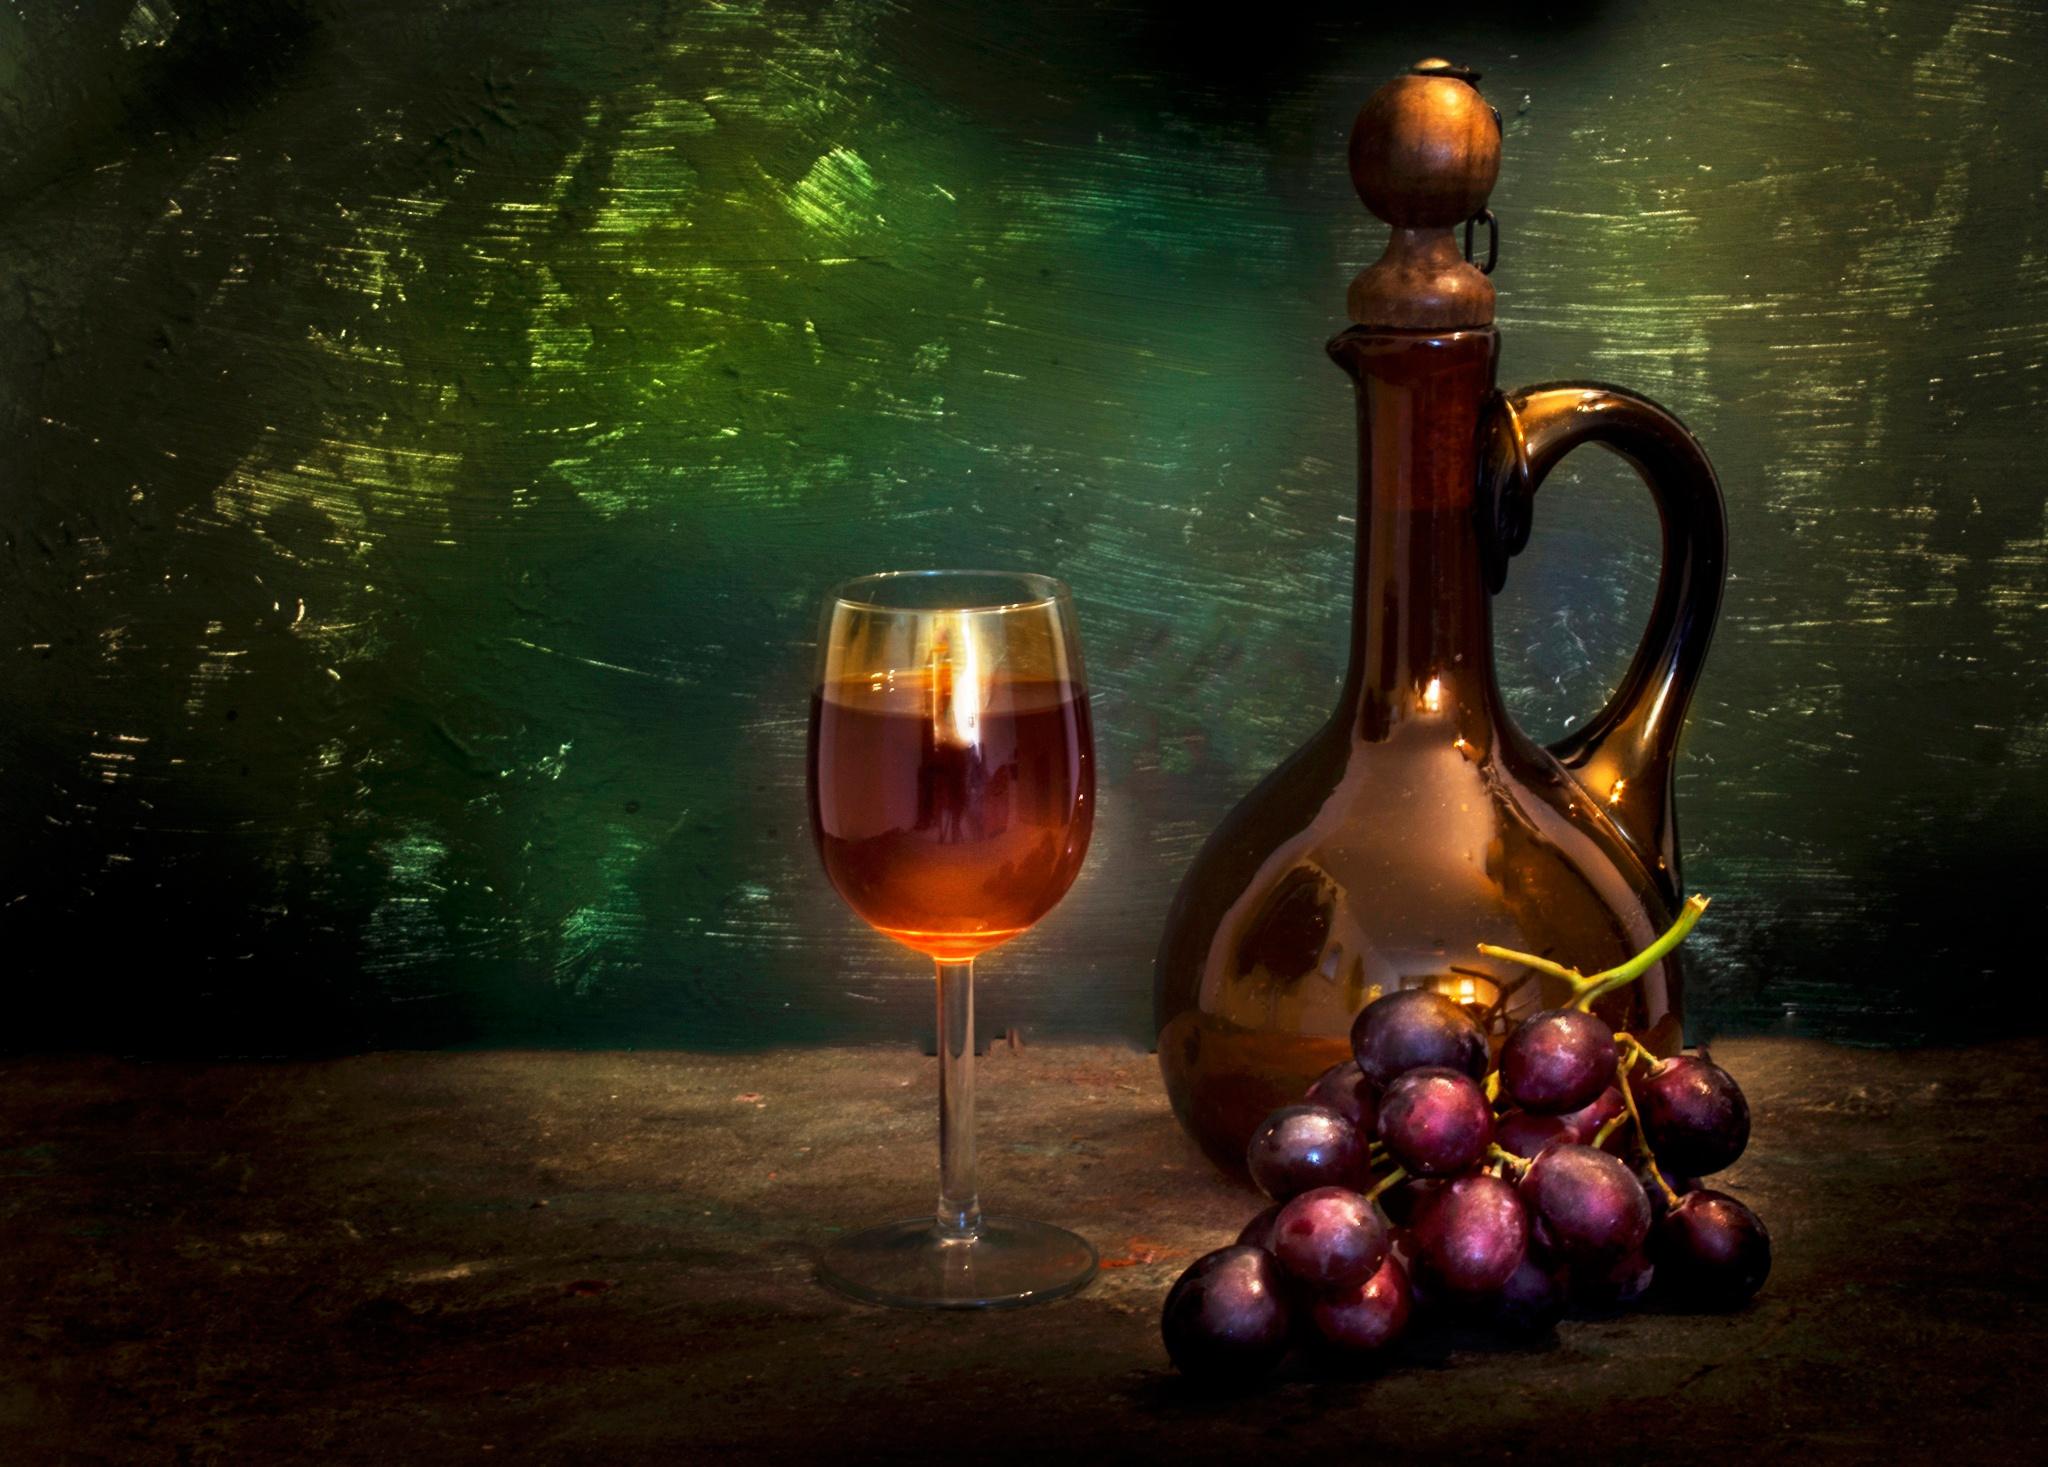 вино в кувшинах картинки выборе яблони